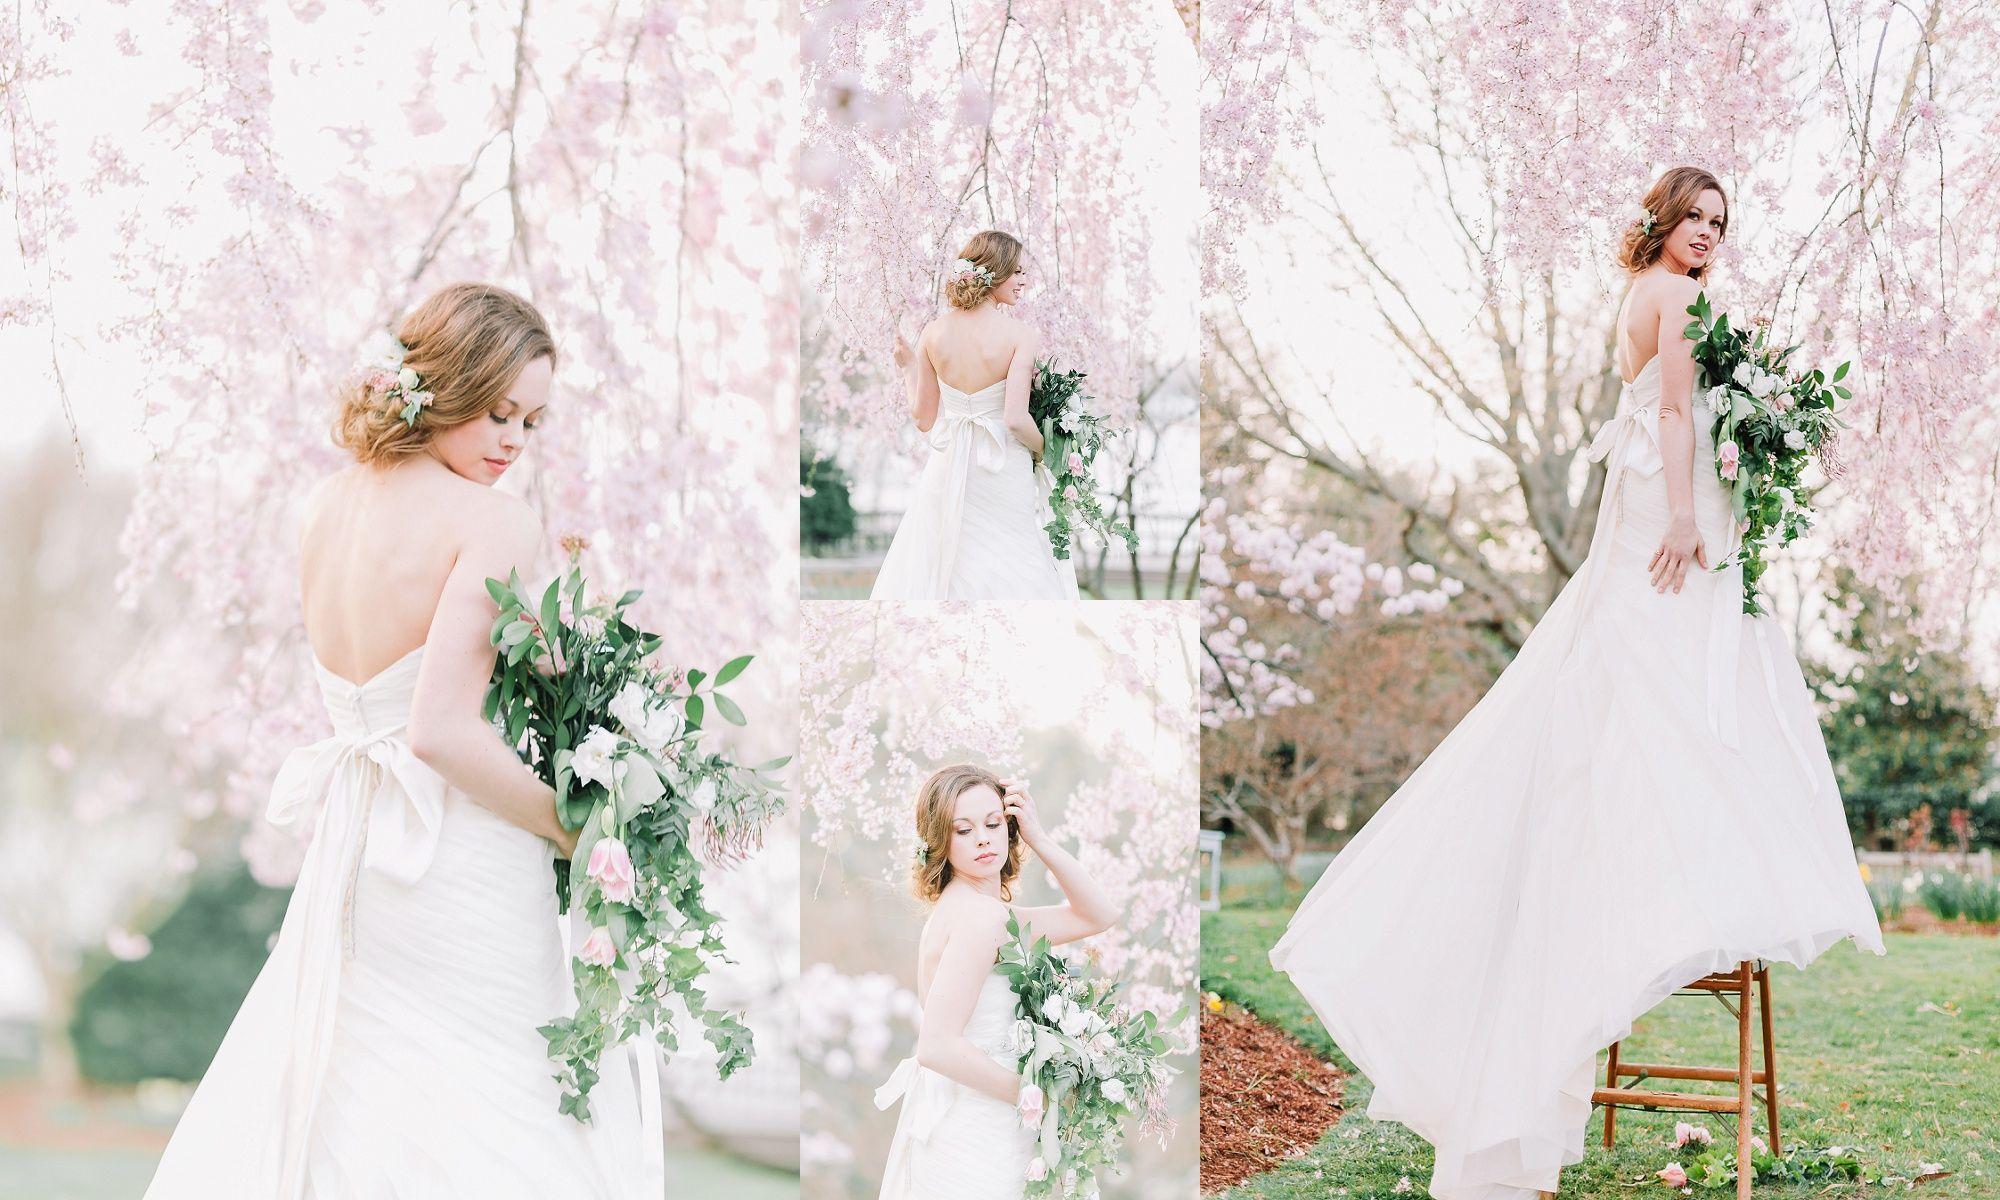 Wedding dresses downtown la  Cherry Blossom Wedding Angela Powell Woulfe Photographer  Angela